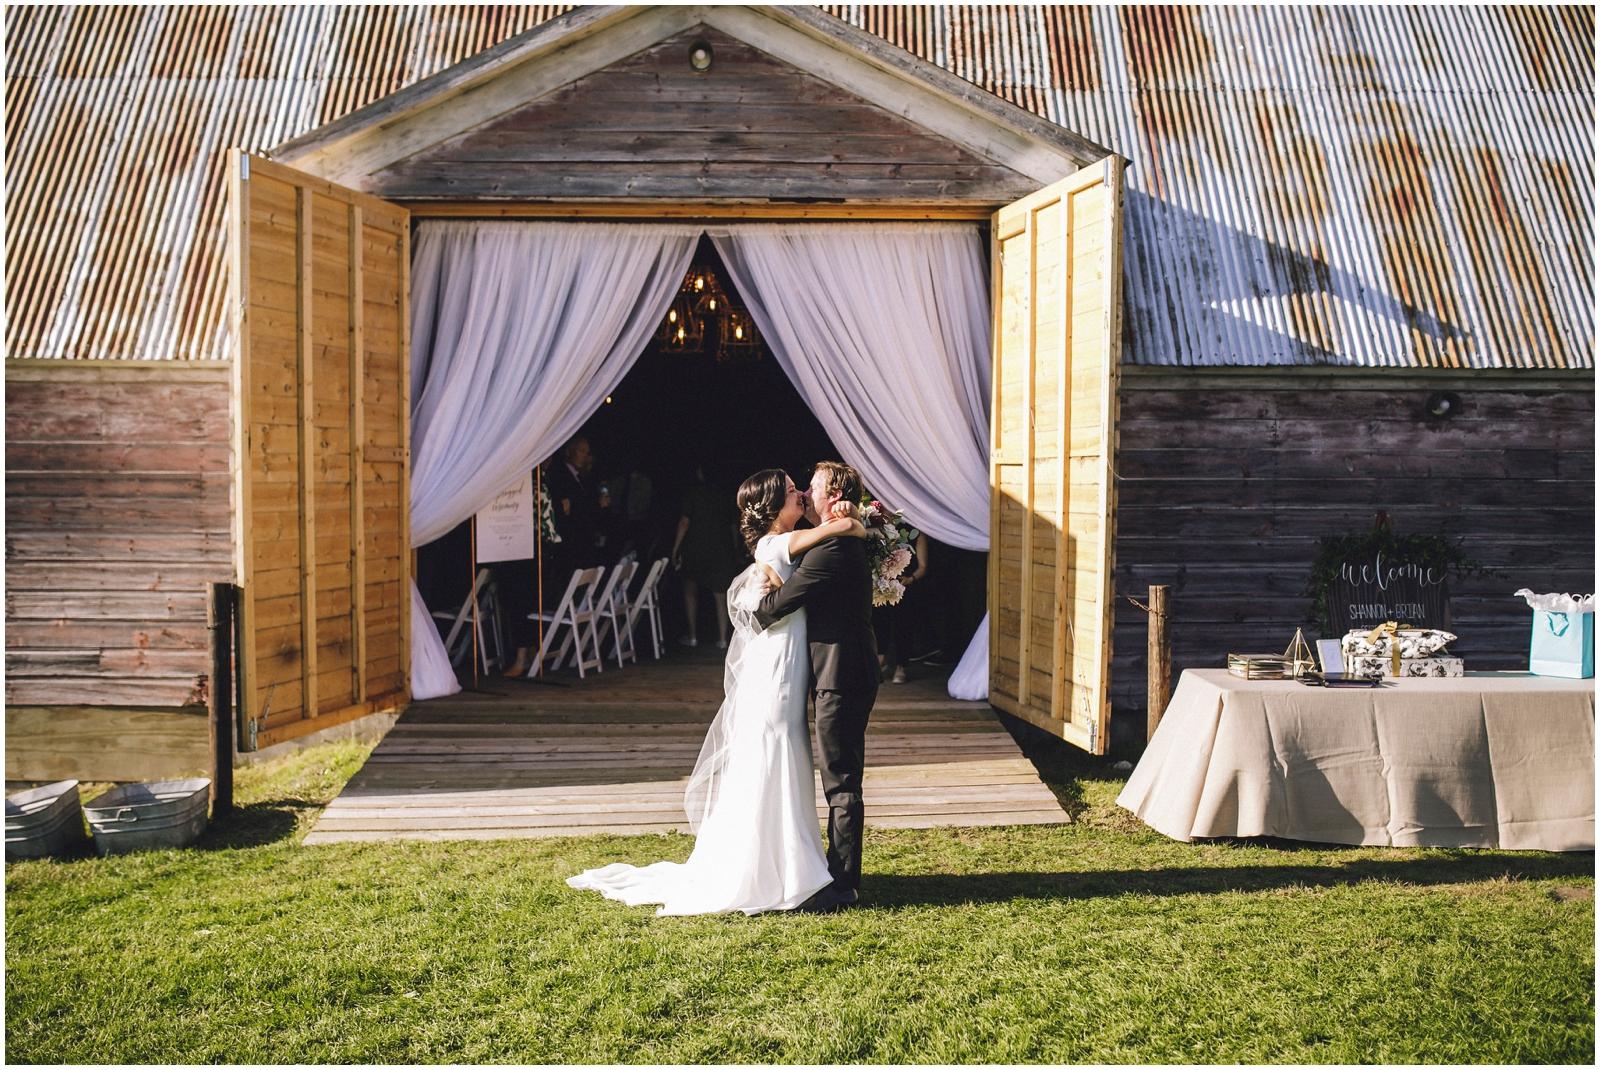 Wedding ceremony in Wisconsin